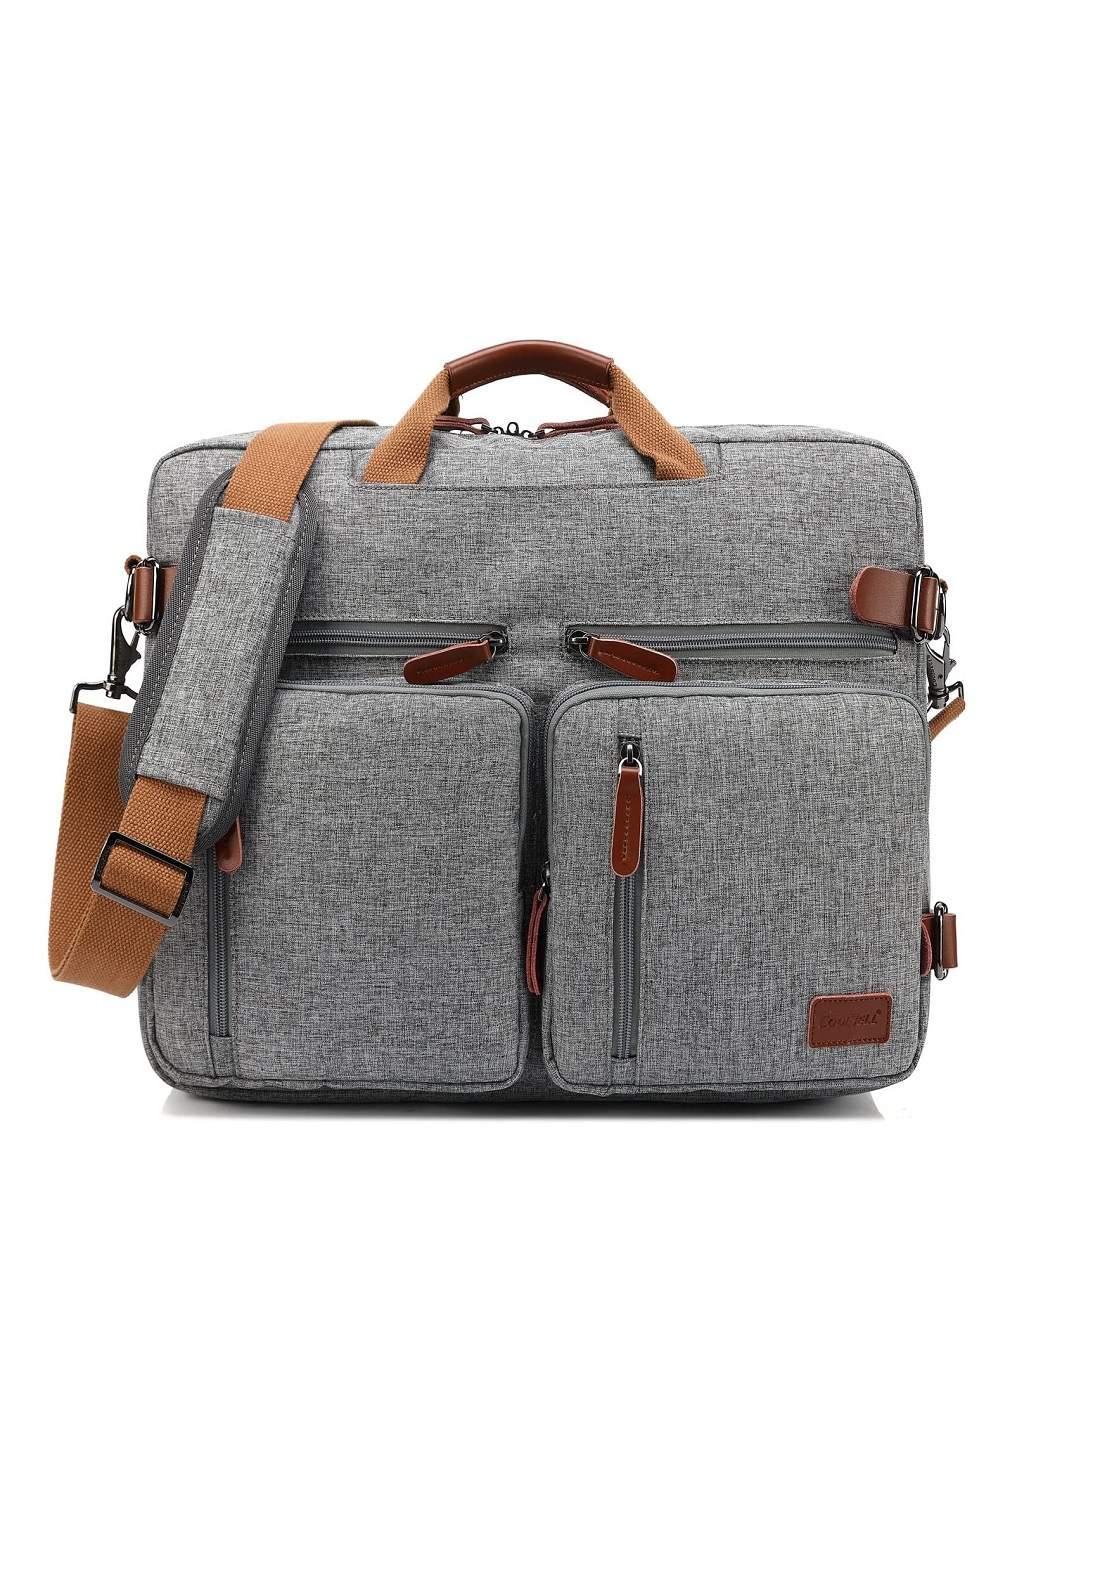 Coll Bell CB-5005 Laptop Bag-Grey حقيبة لابتوب